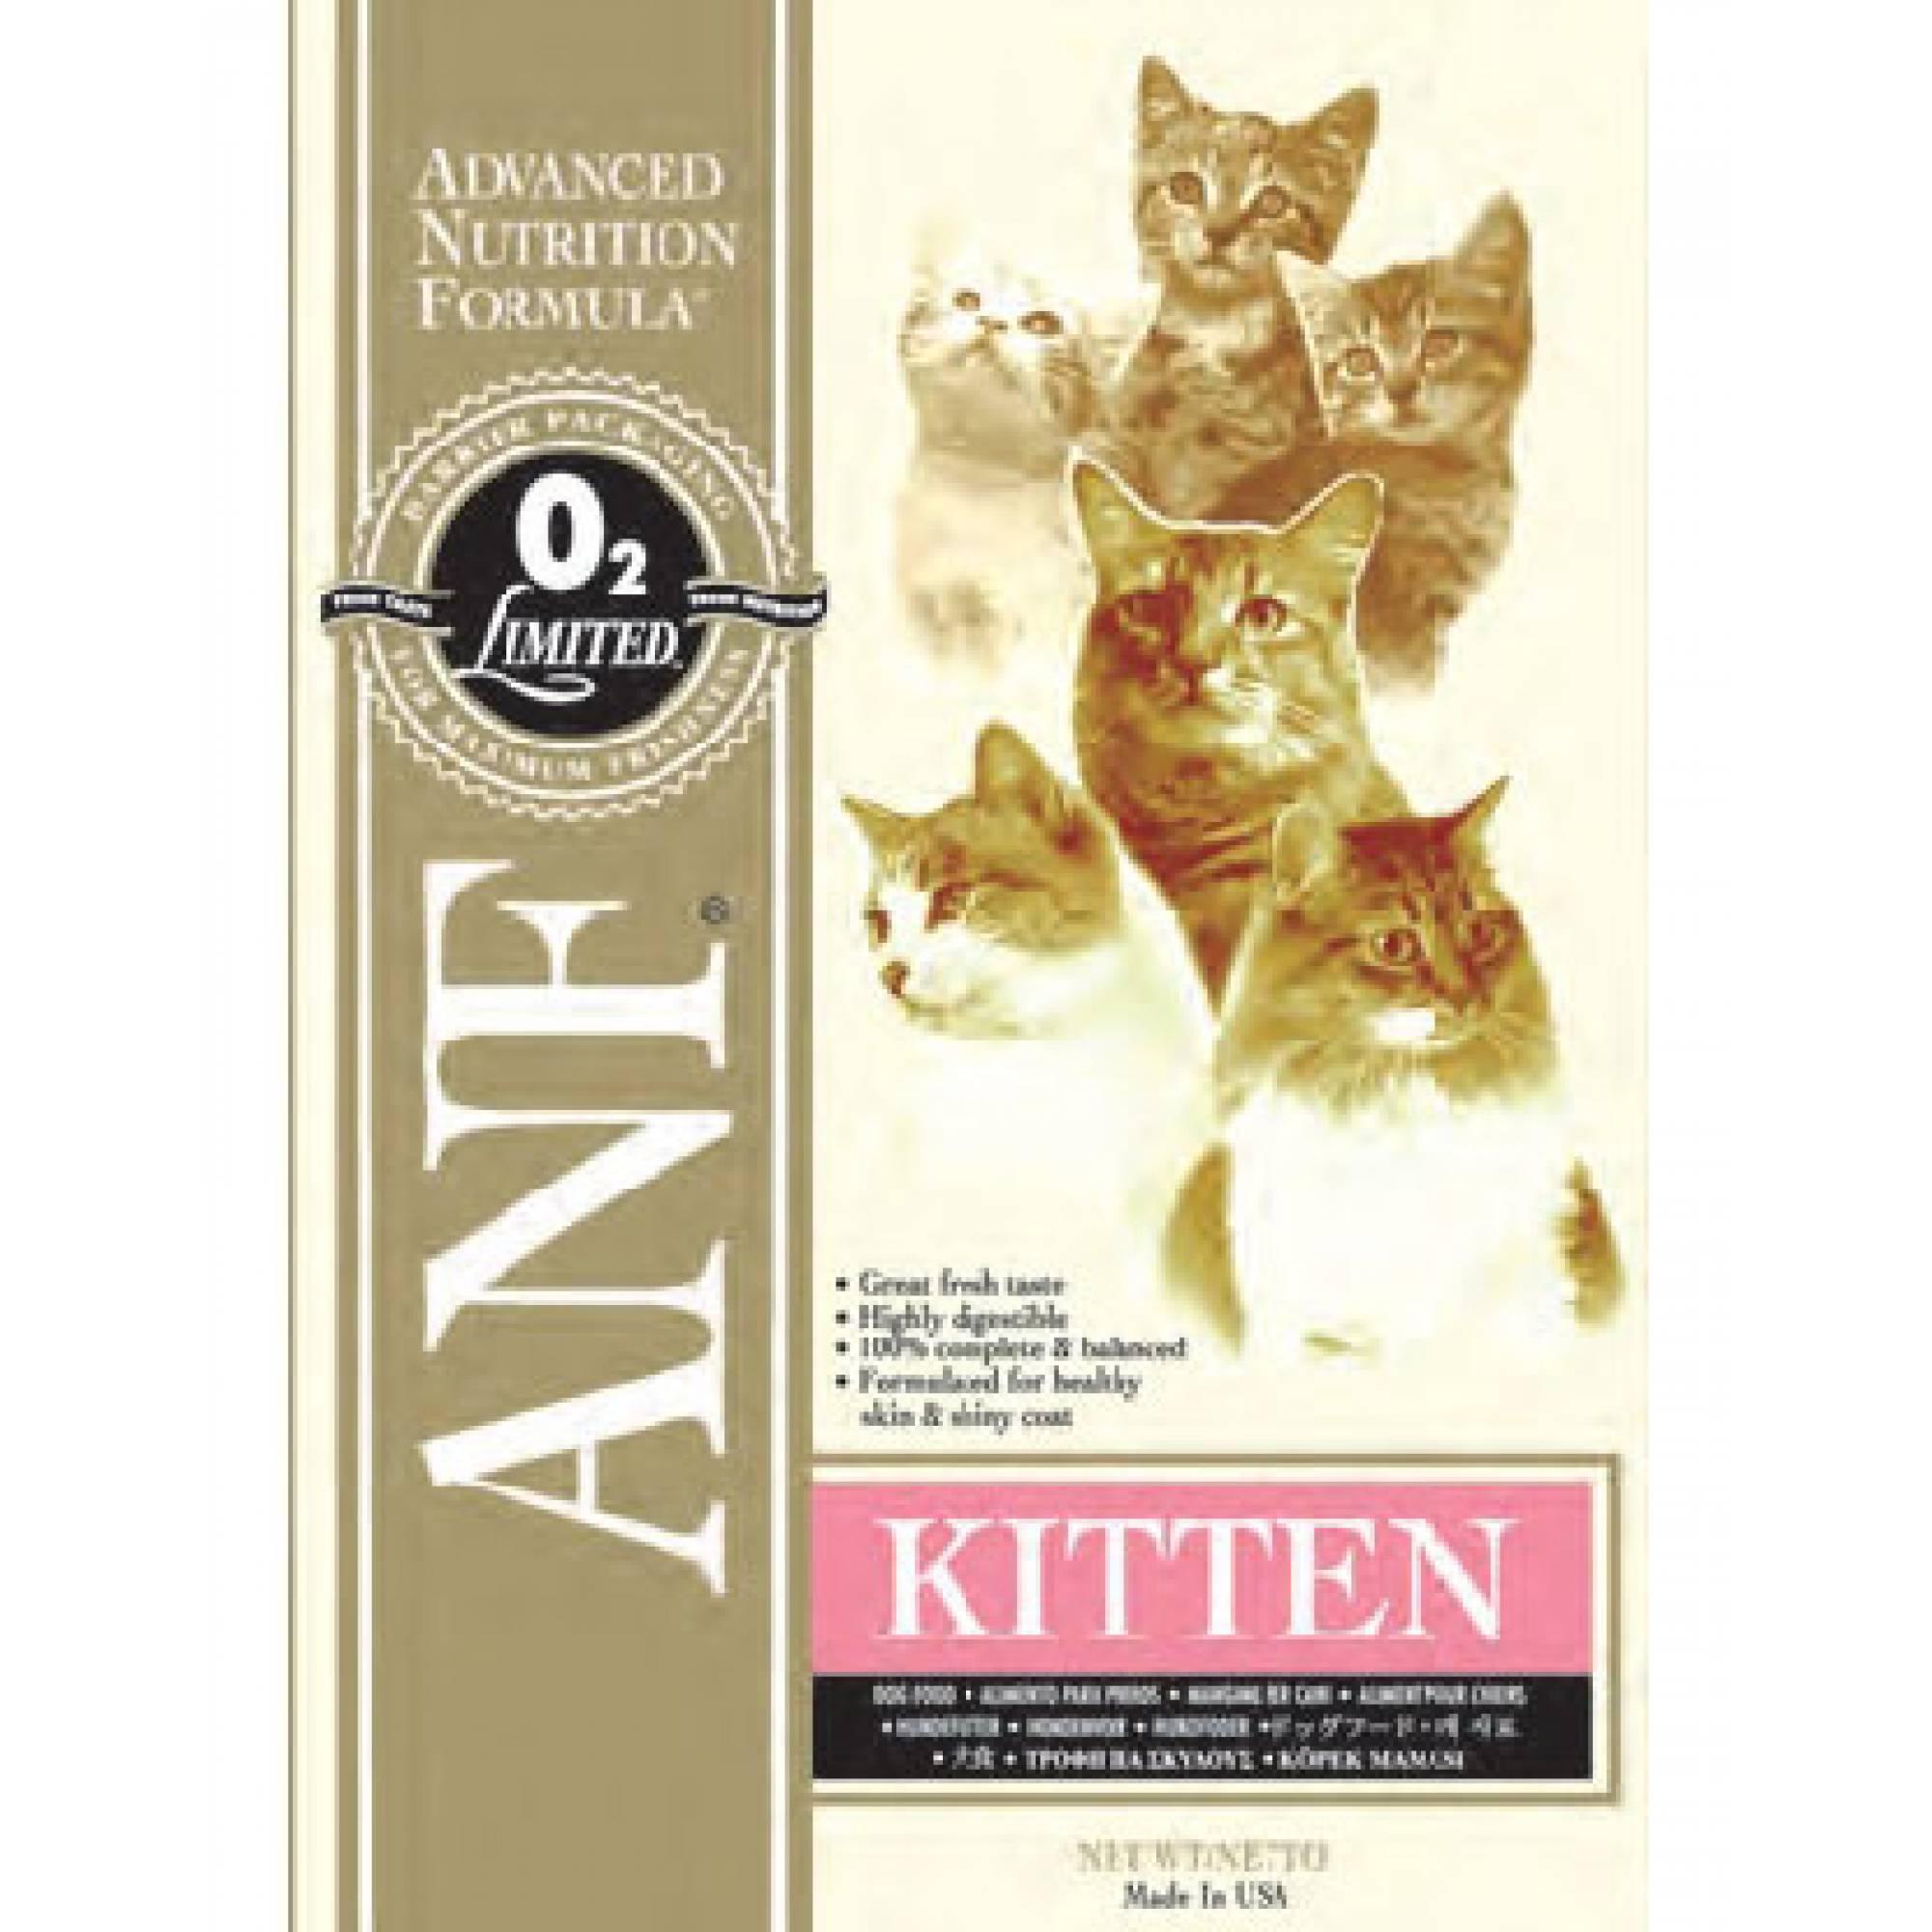 ANF - Cat Kitten 1kg